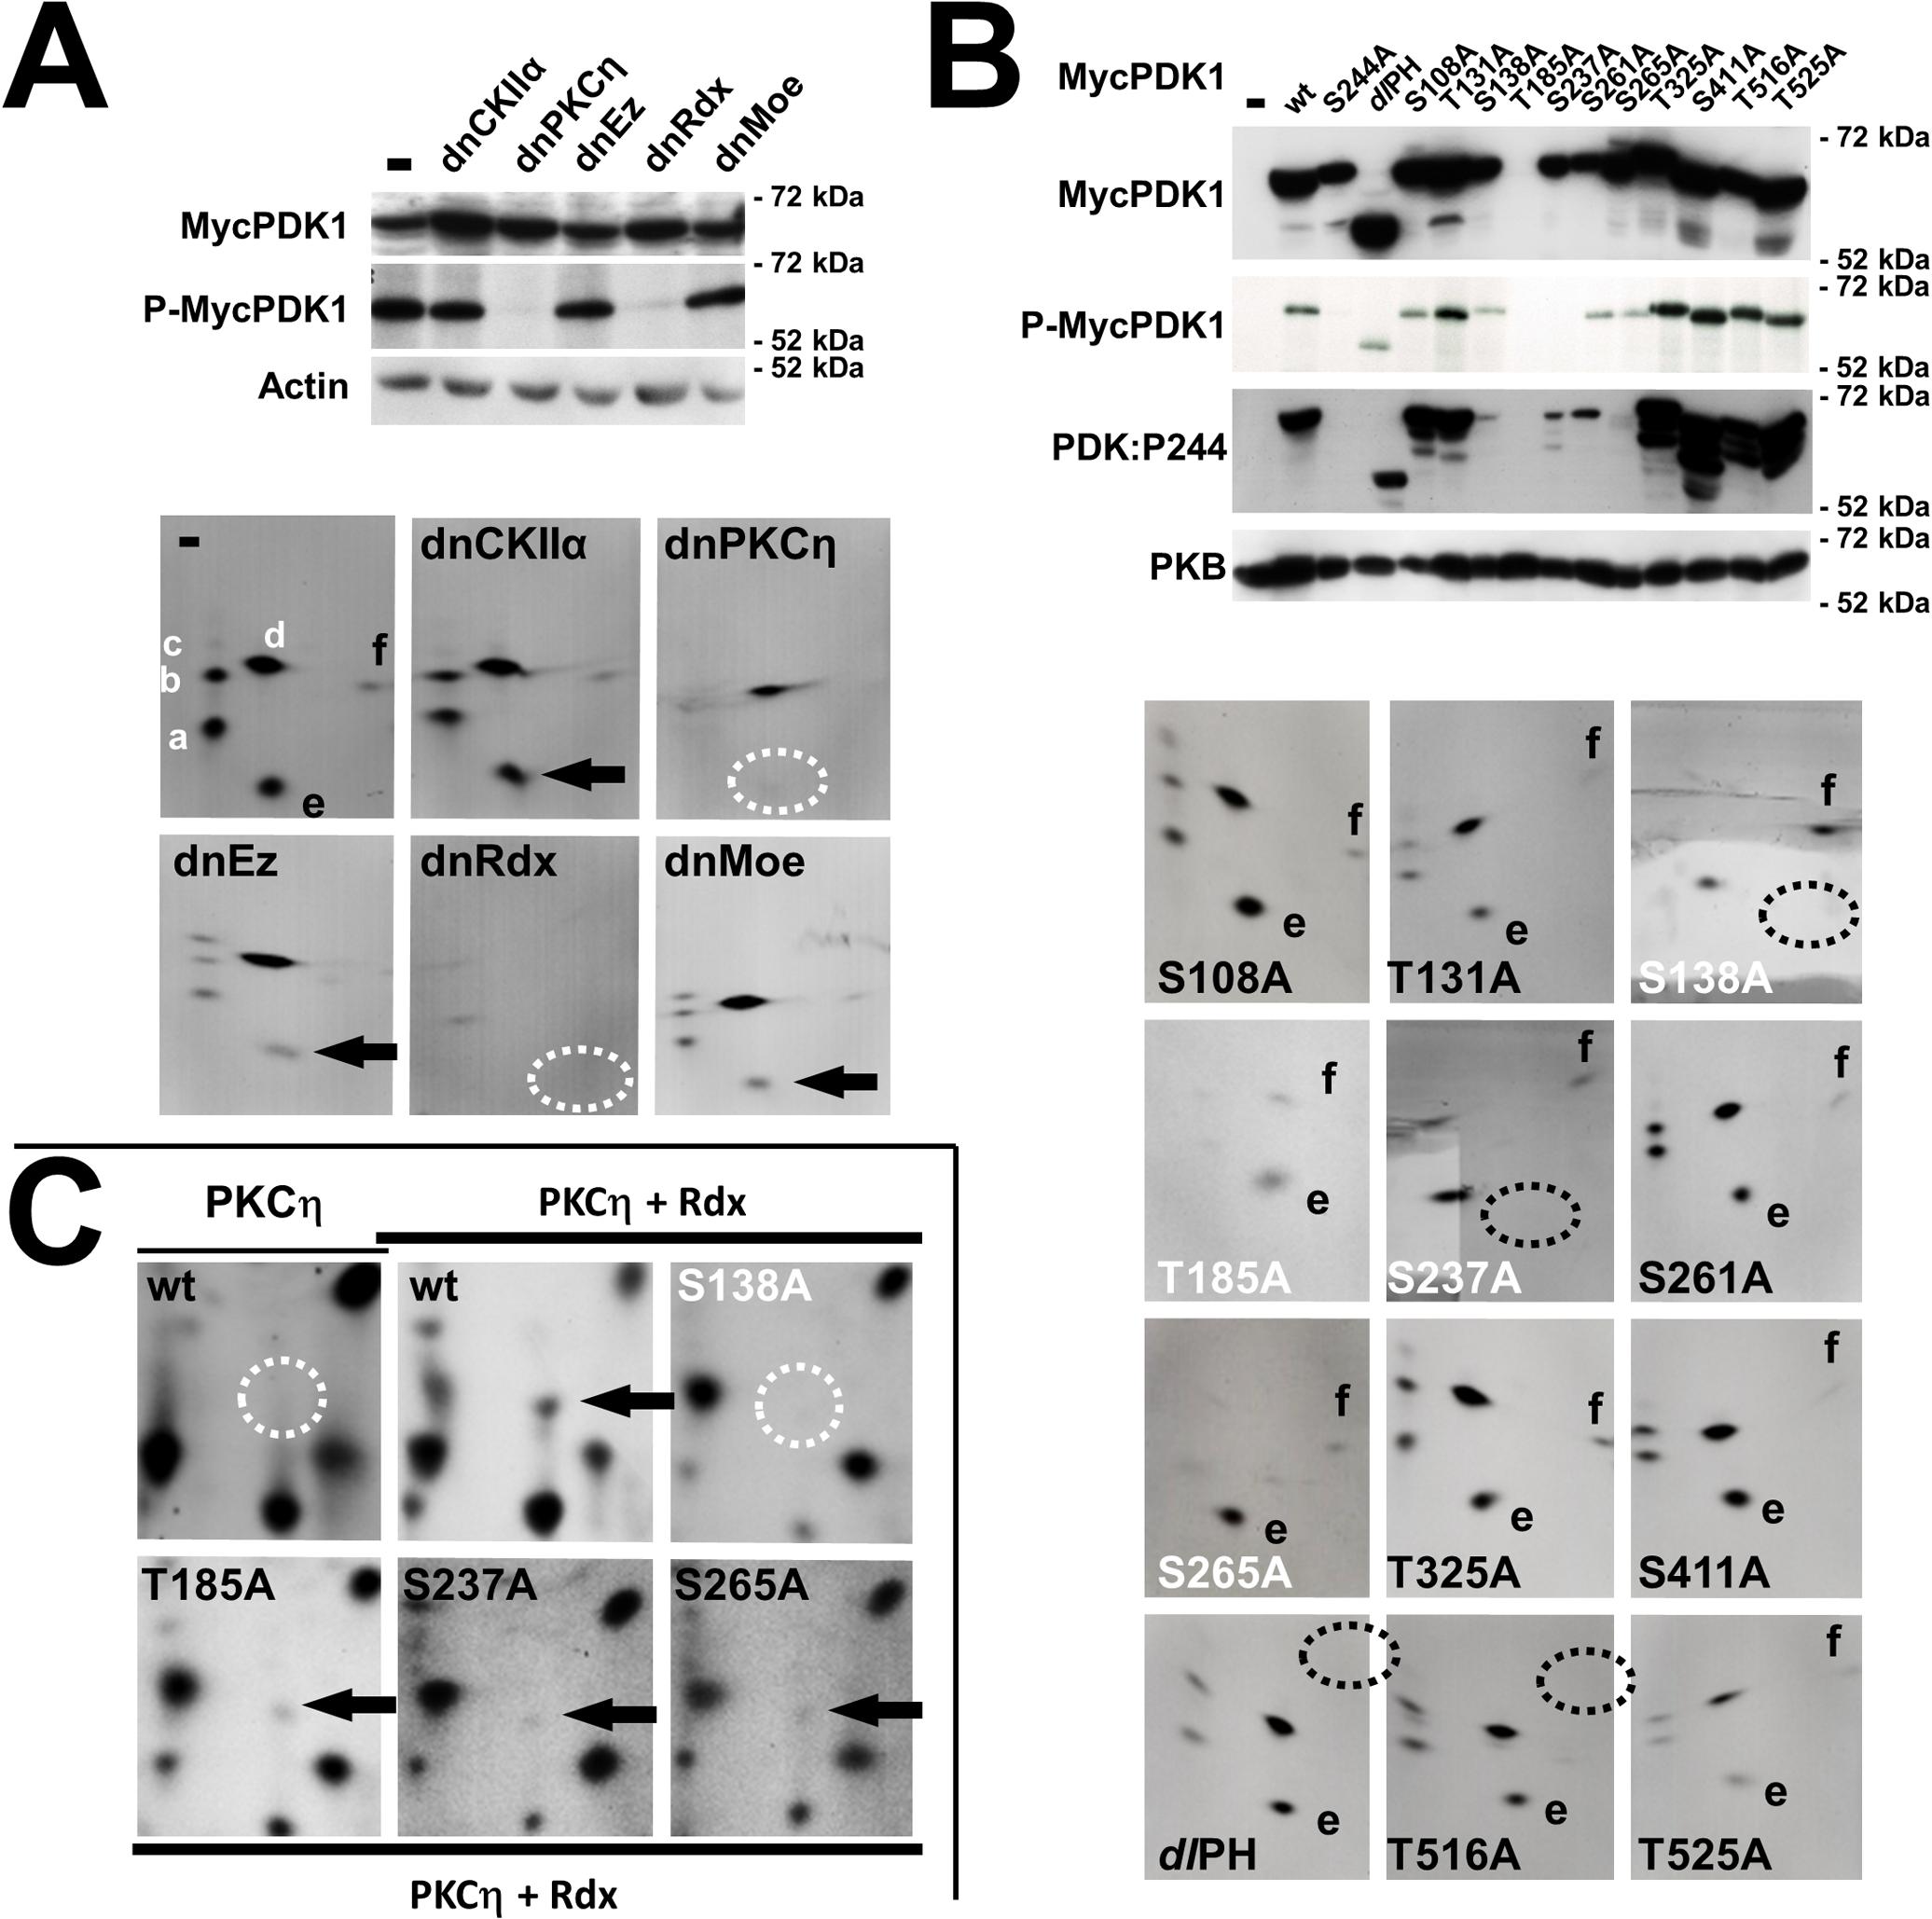 MVM induces PDK1 activation through PKCη/Rdx-driven <i>trans</i>-phosphorylation at S138.